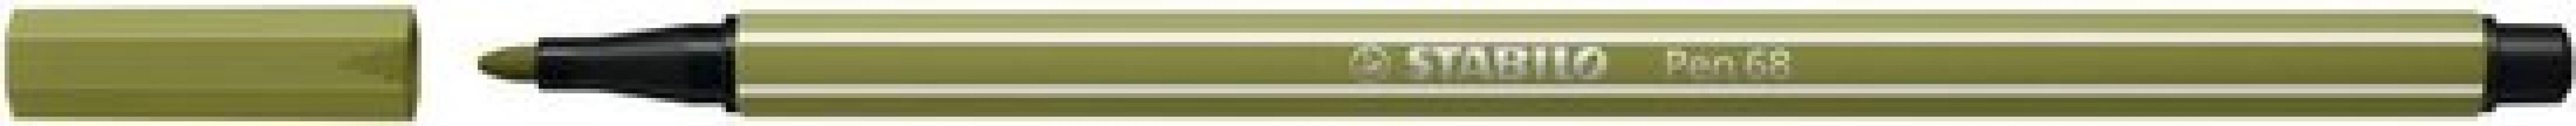 , Viltstift STABILO Pen 68/37 modder groen